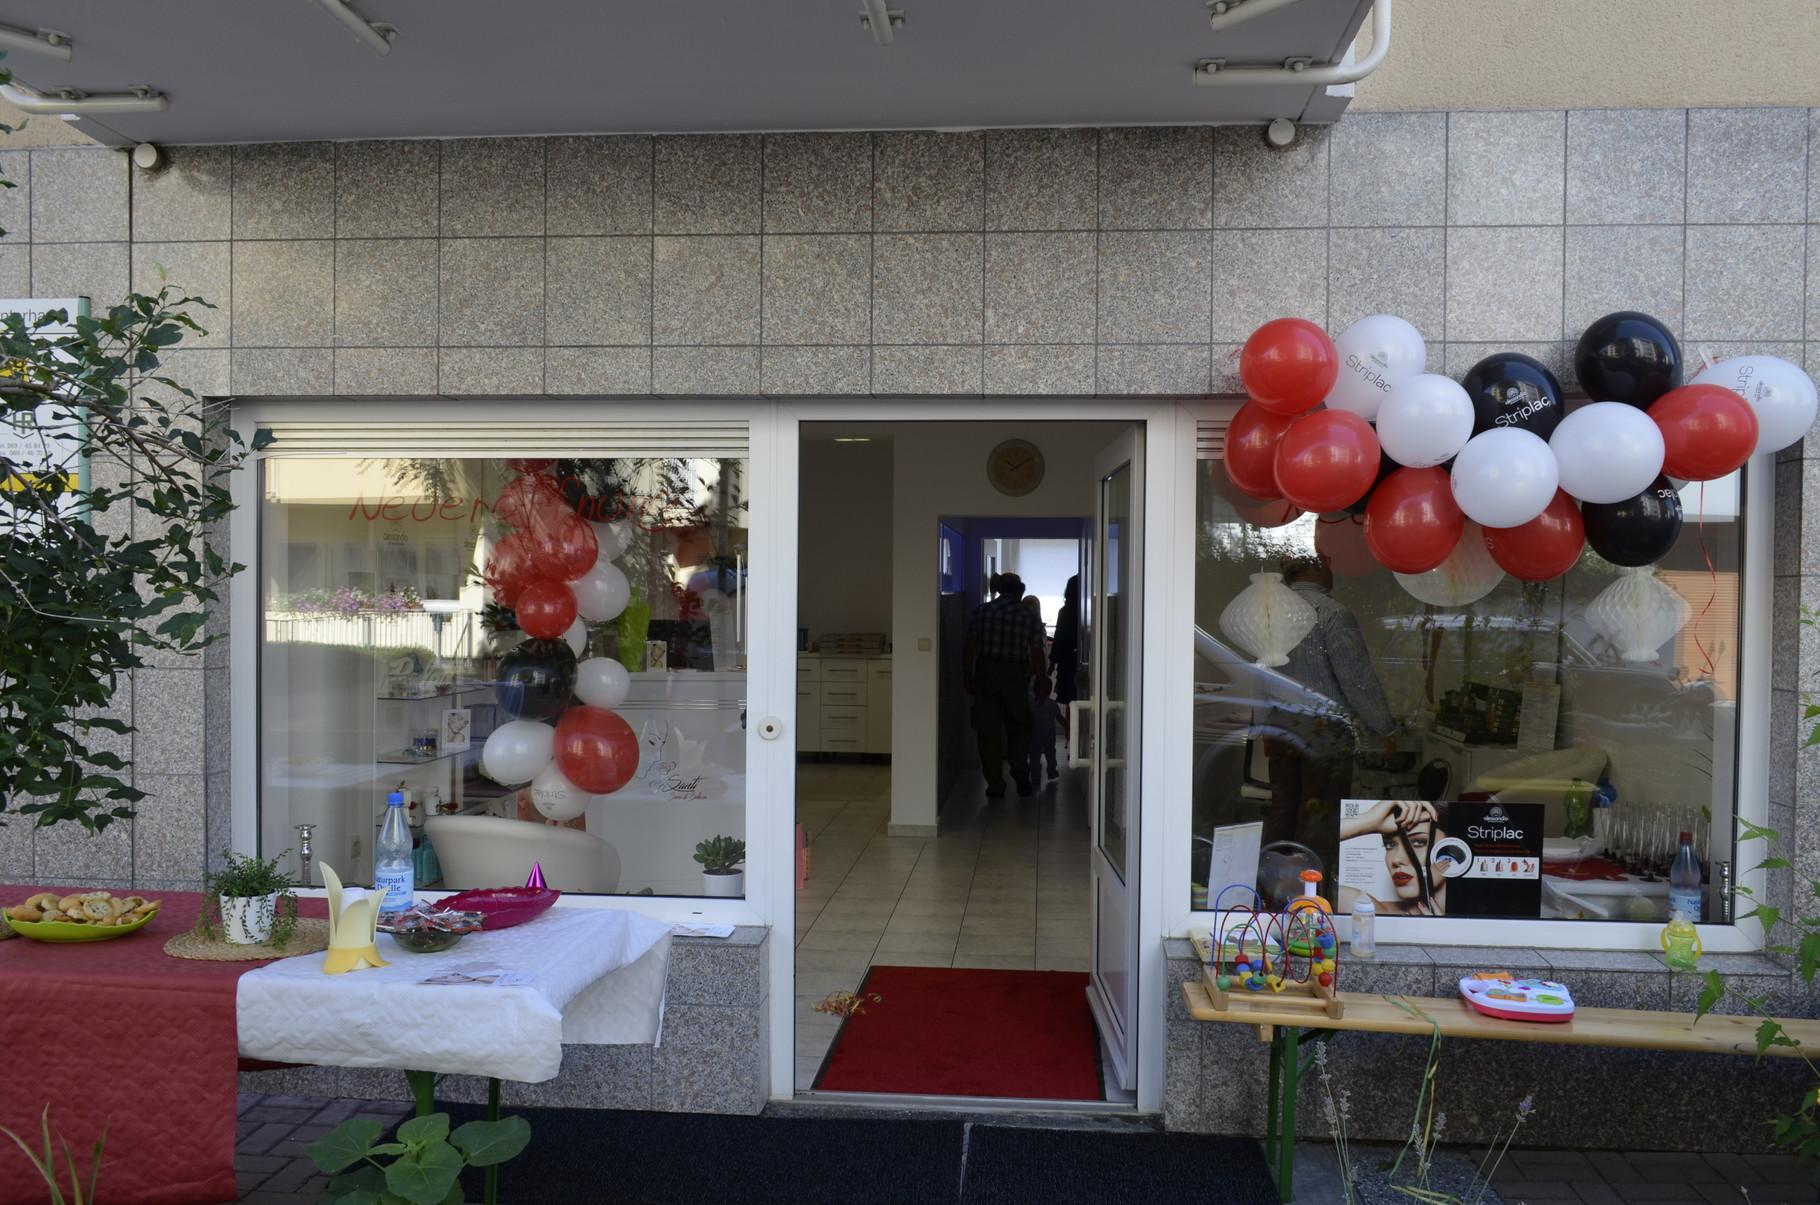 Kosmetiksalon Santi - Eingangsbereich